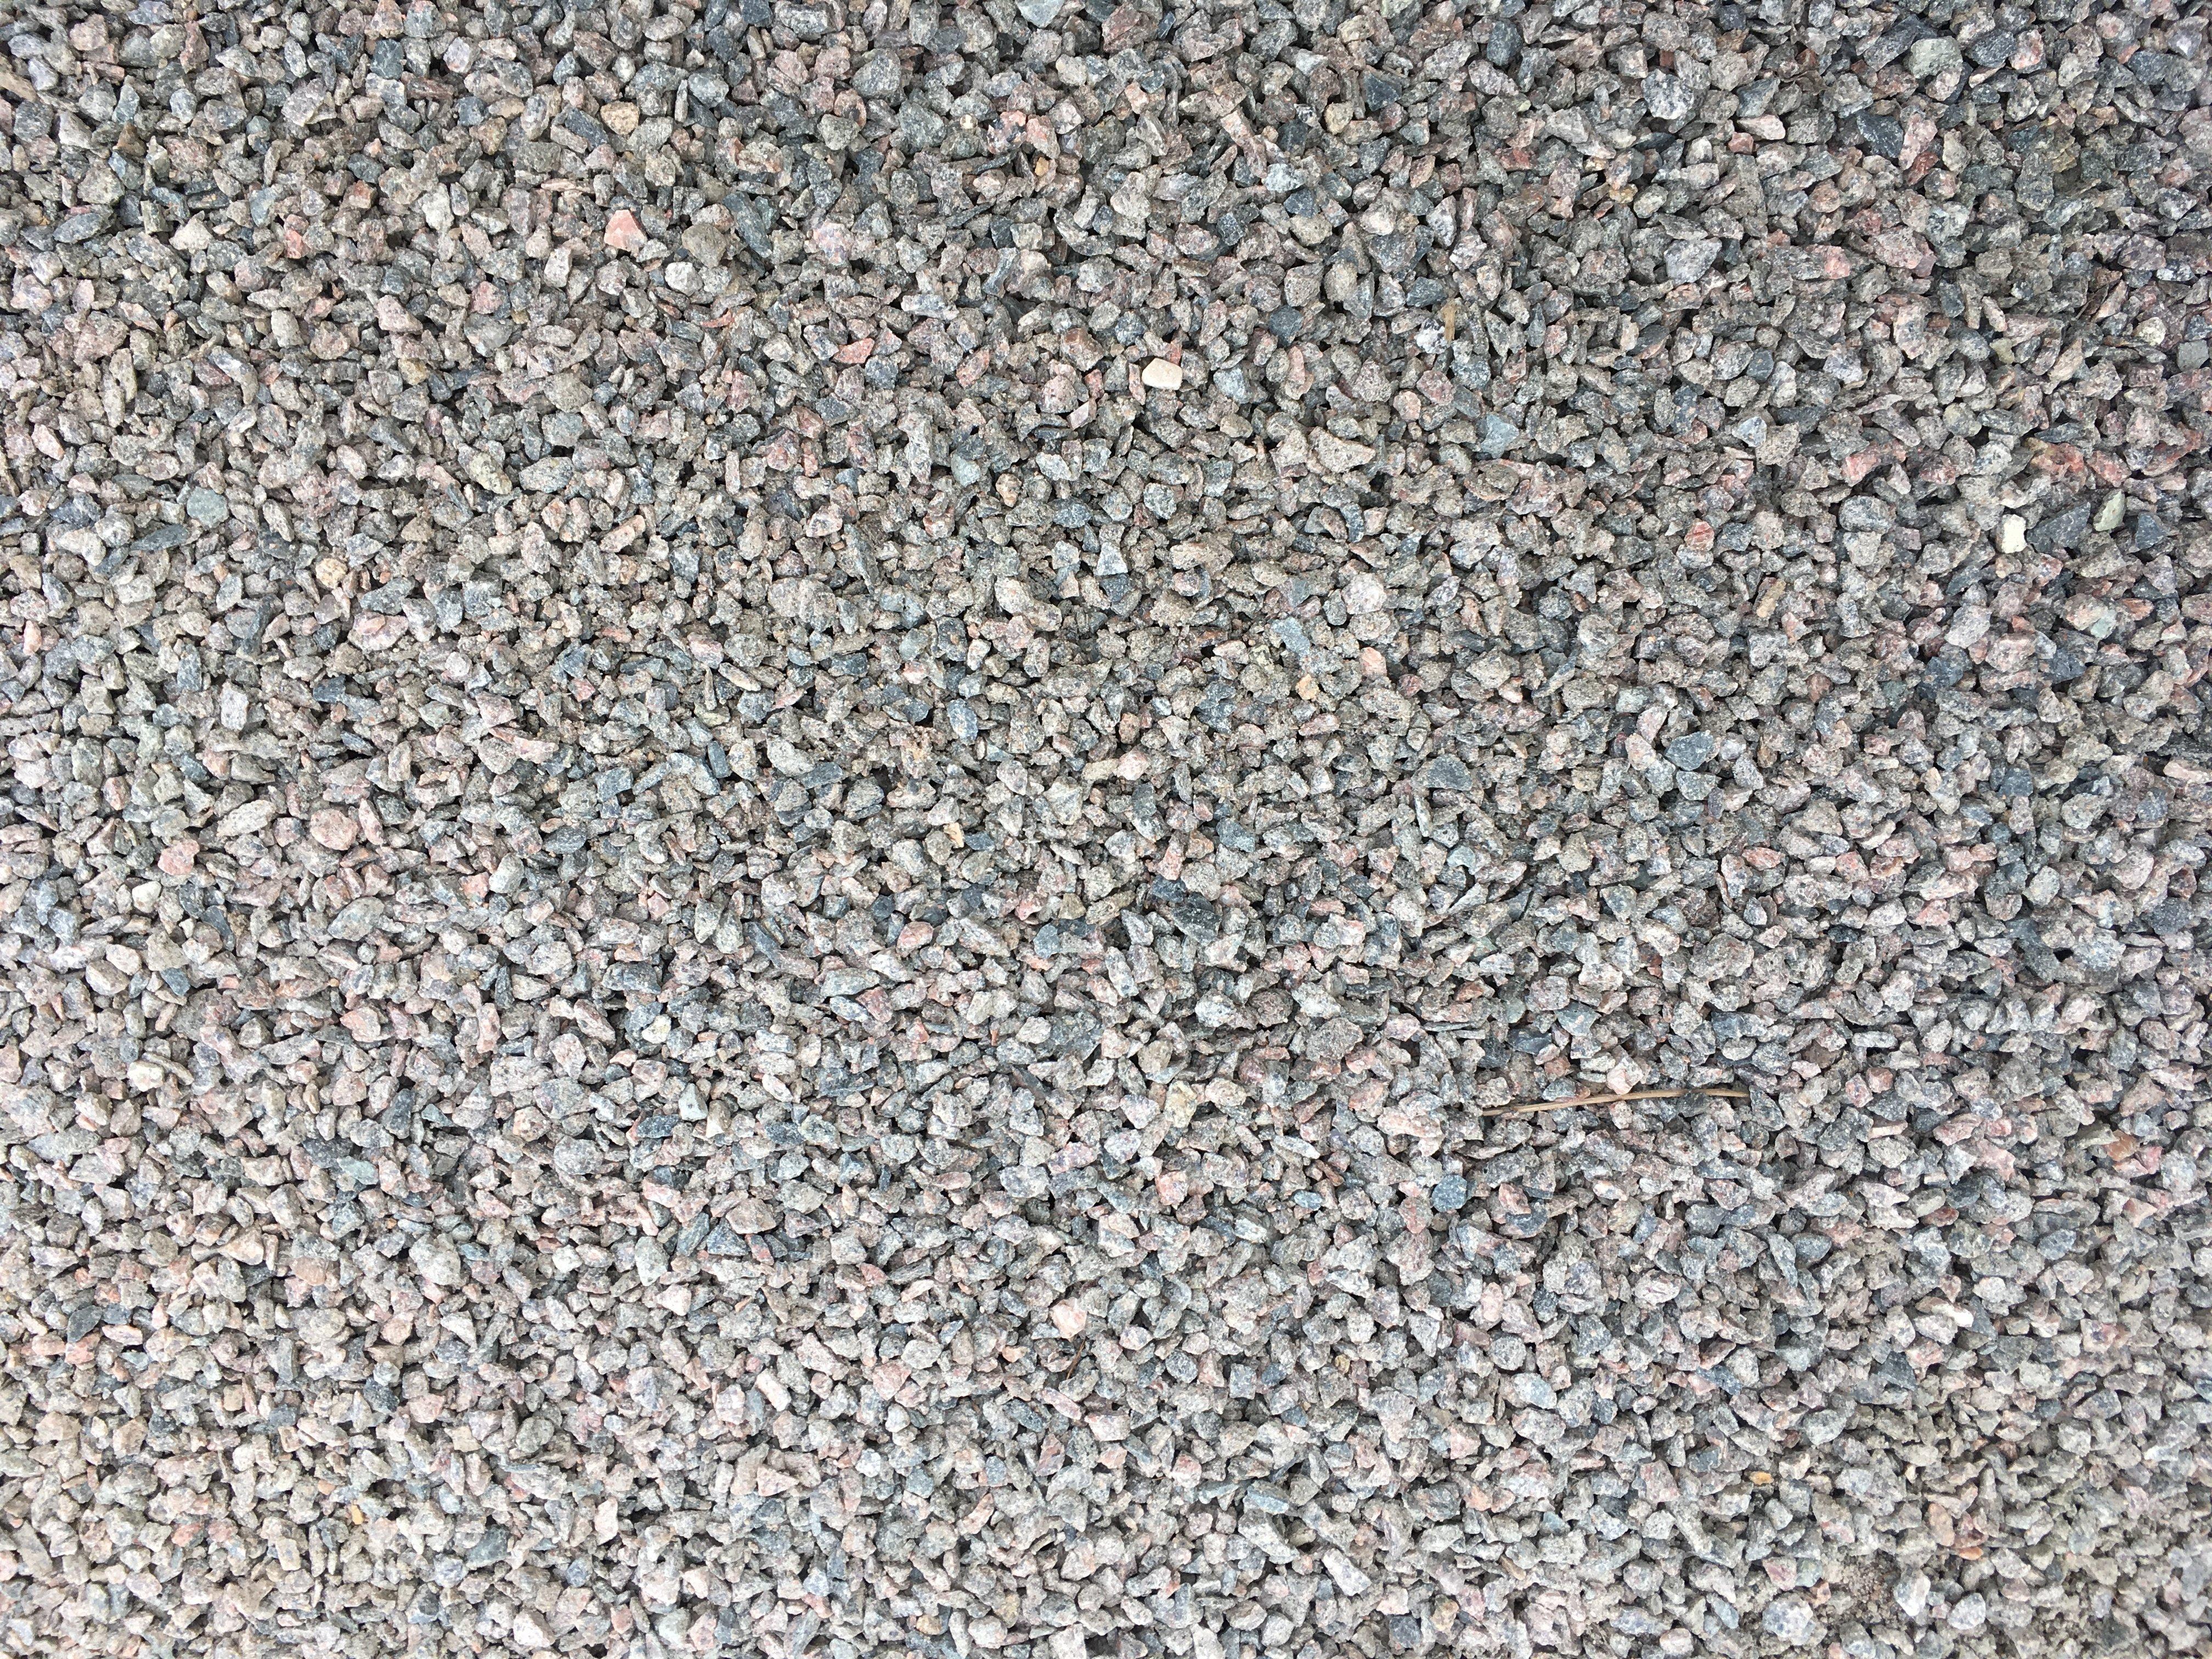 Granite (3/8 inch)